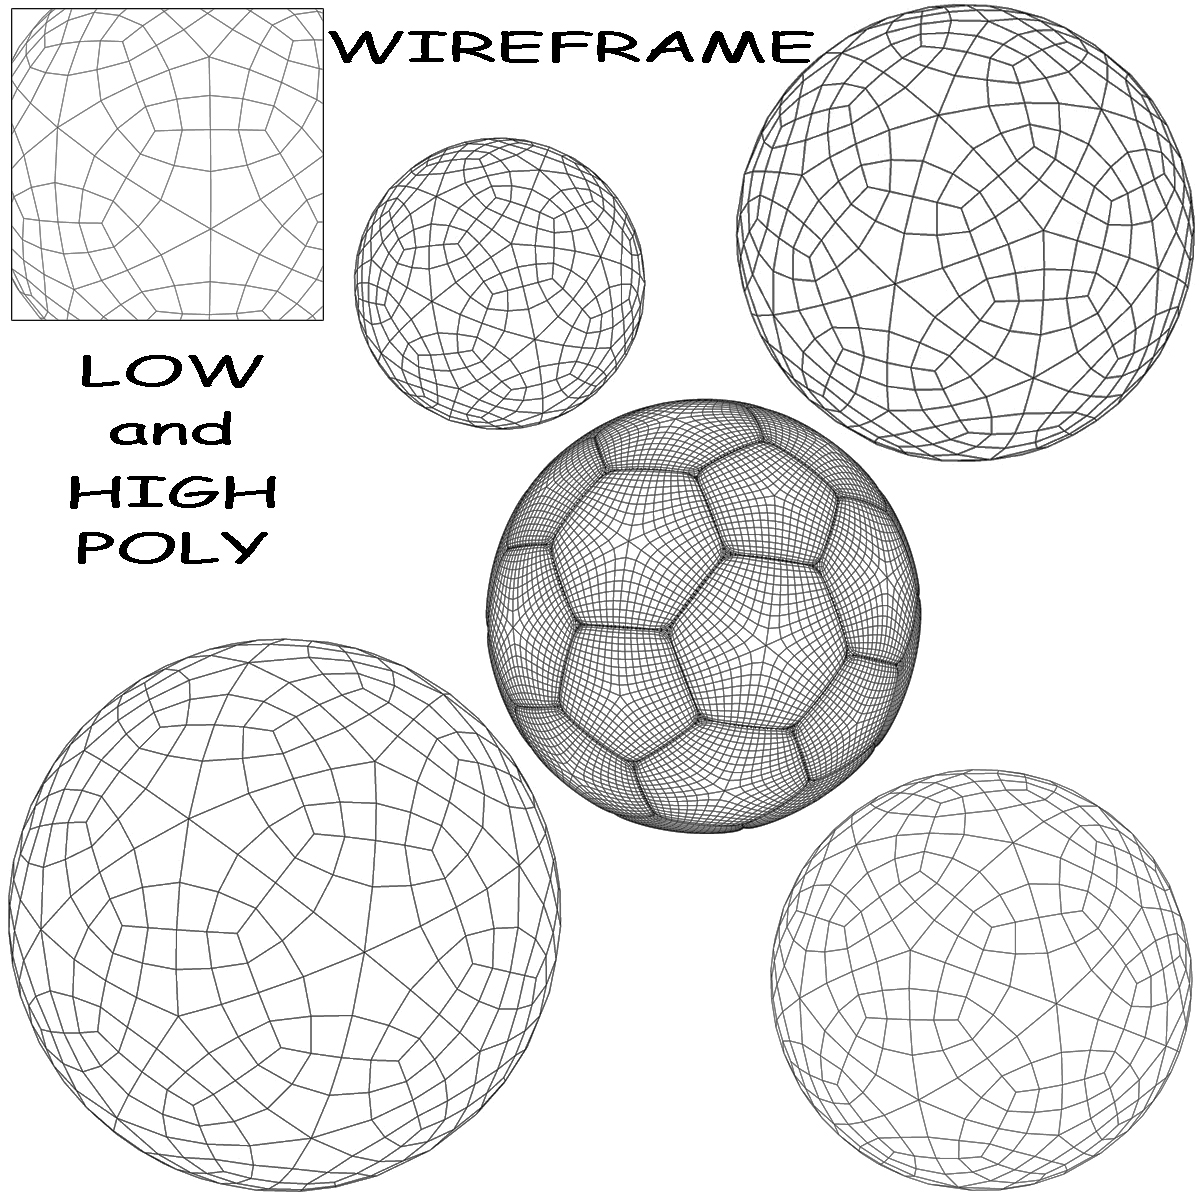 soccerball цэнхэр цагаан 3d загвар 3ds max fbx c4d ma mb obj 203985